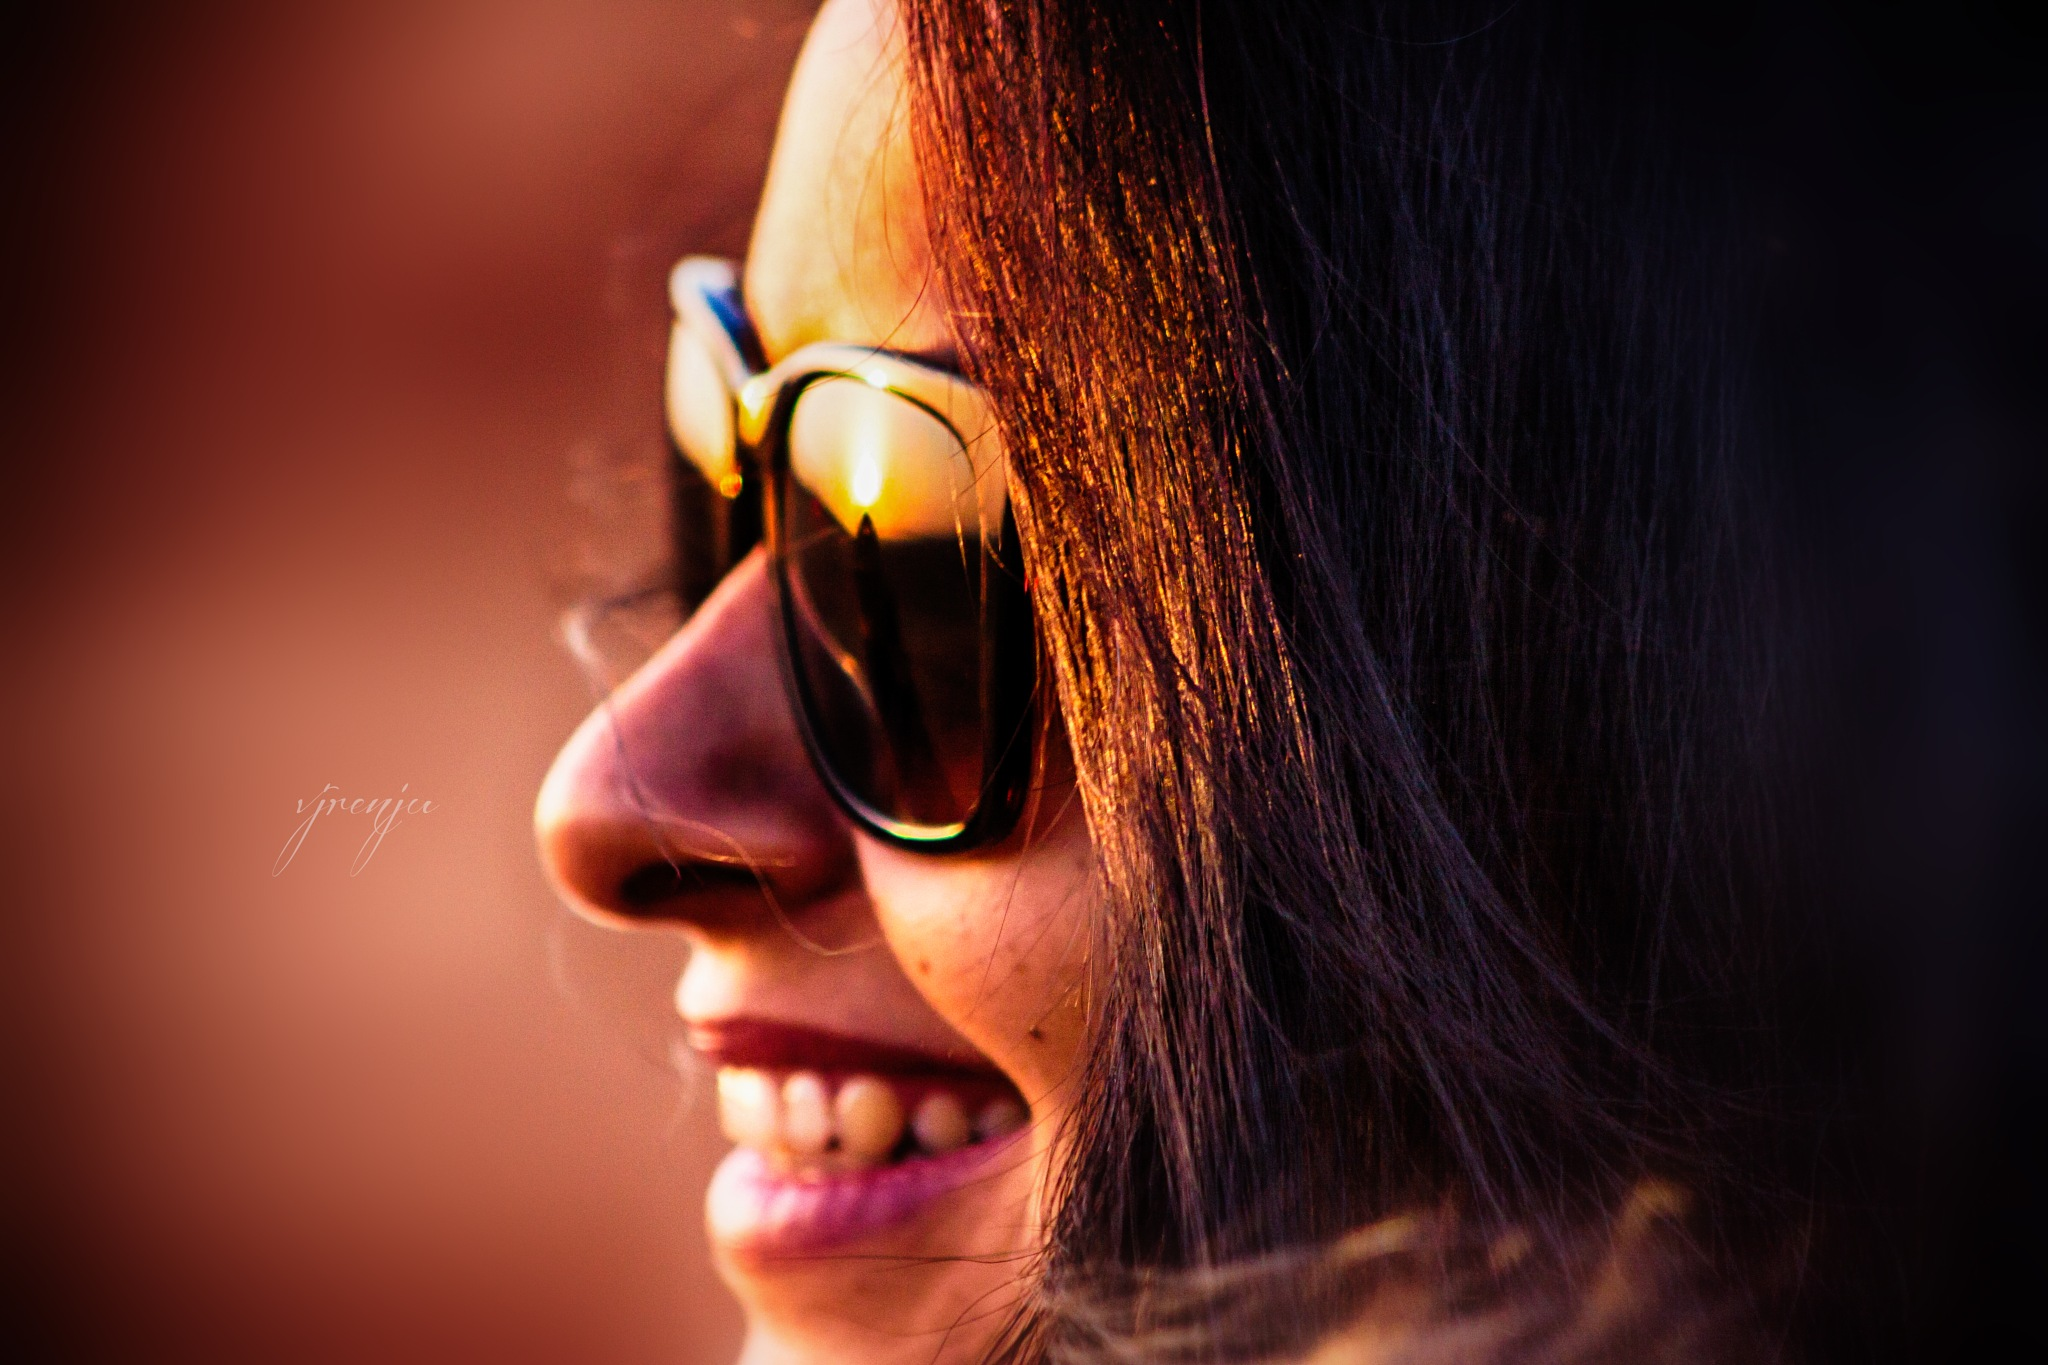 The golden girl by VJ Renju